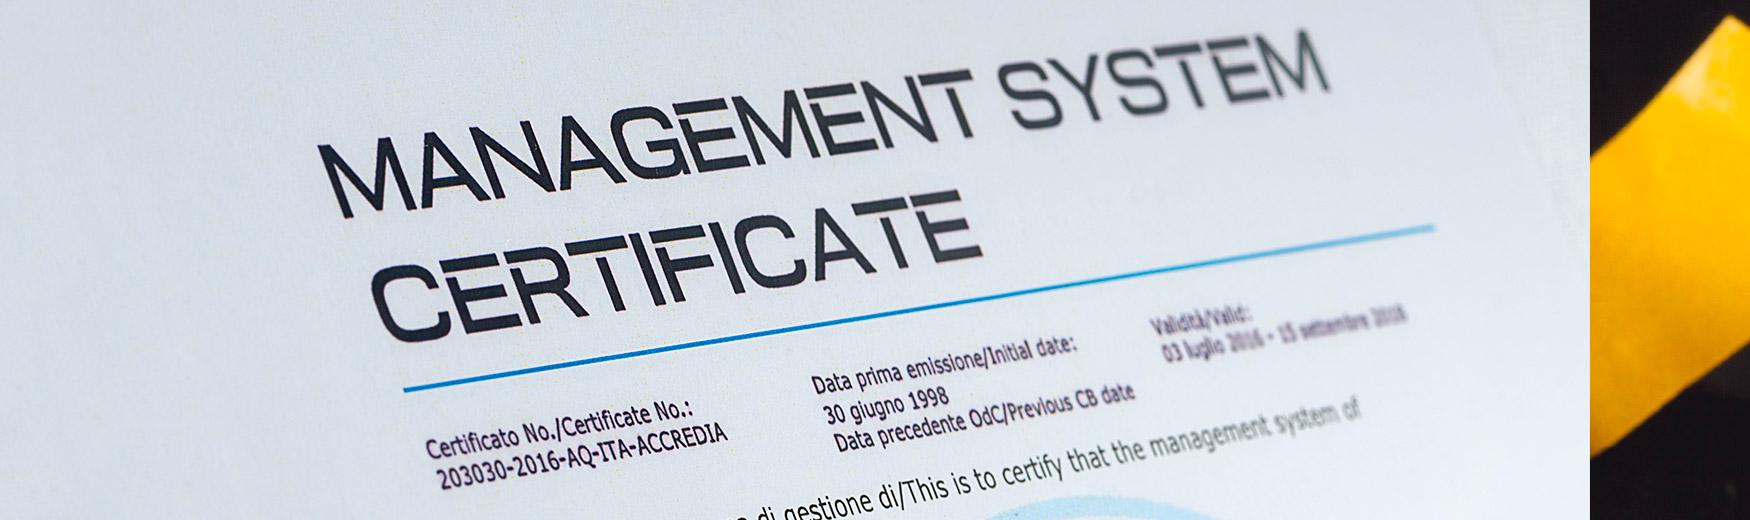 Bo Certifications List